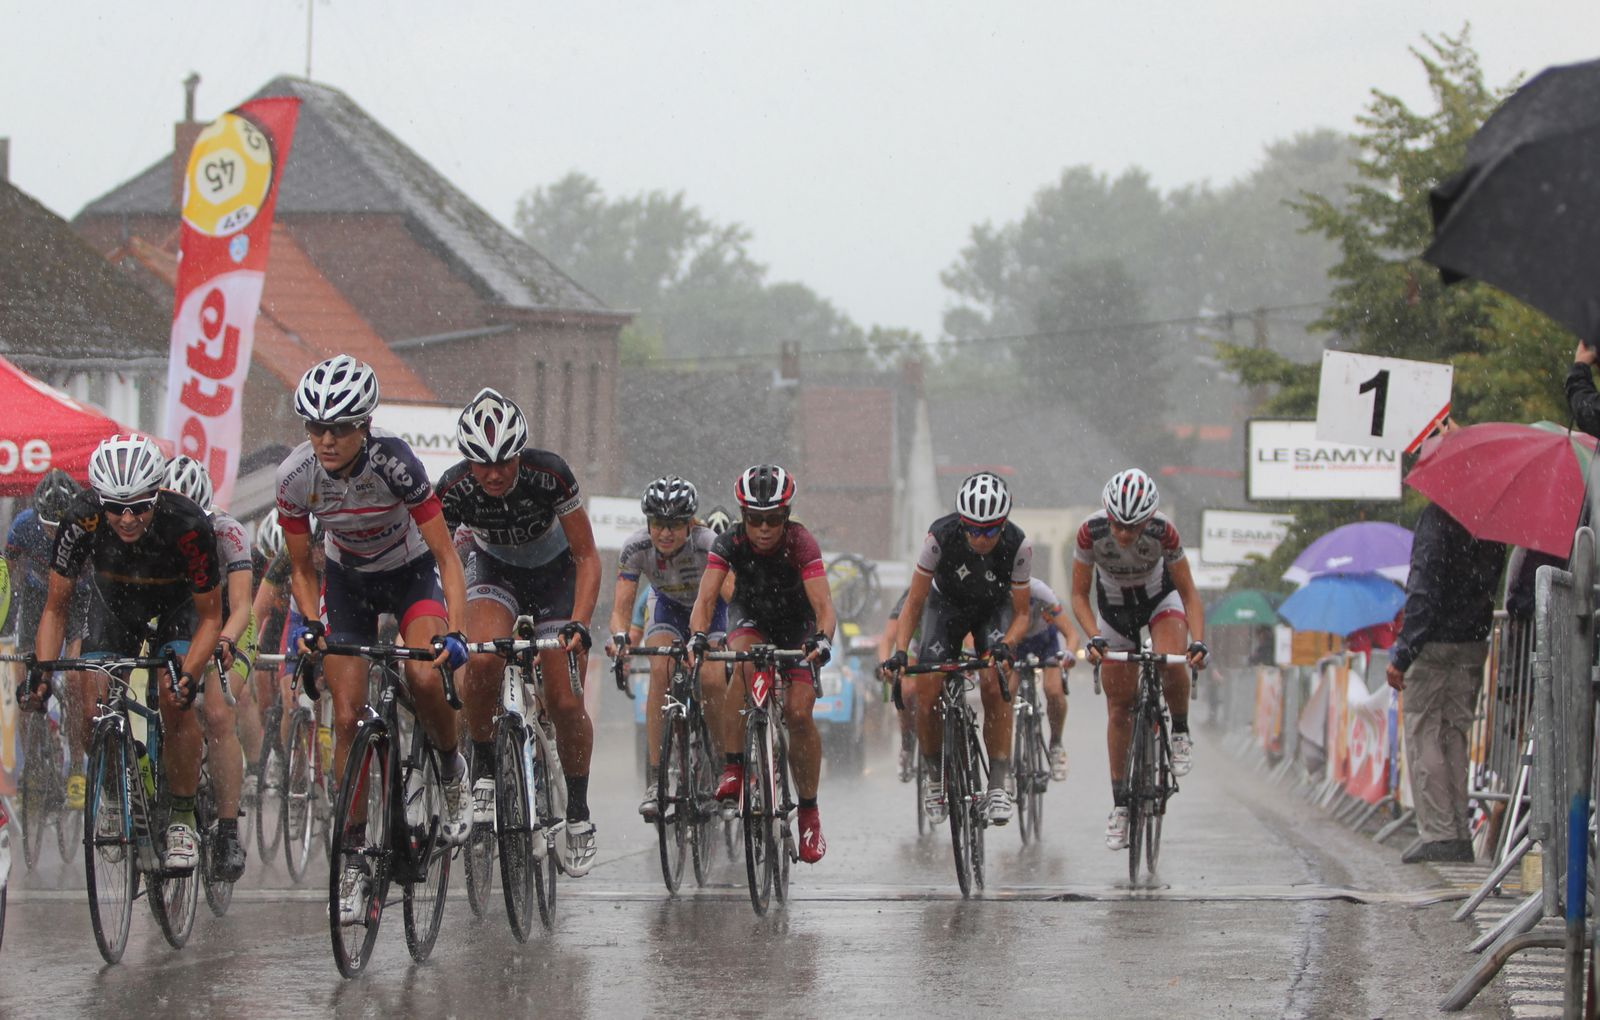 Les conditions sont dantesques. Zoom sur Evelyn Arys, Carlee Taylor et Chantal Blaak.